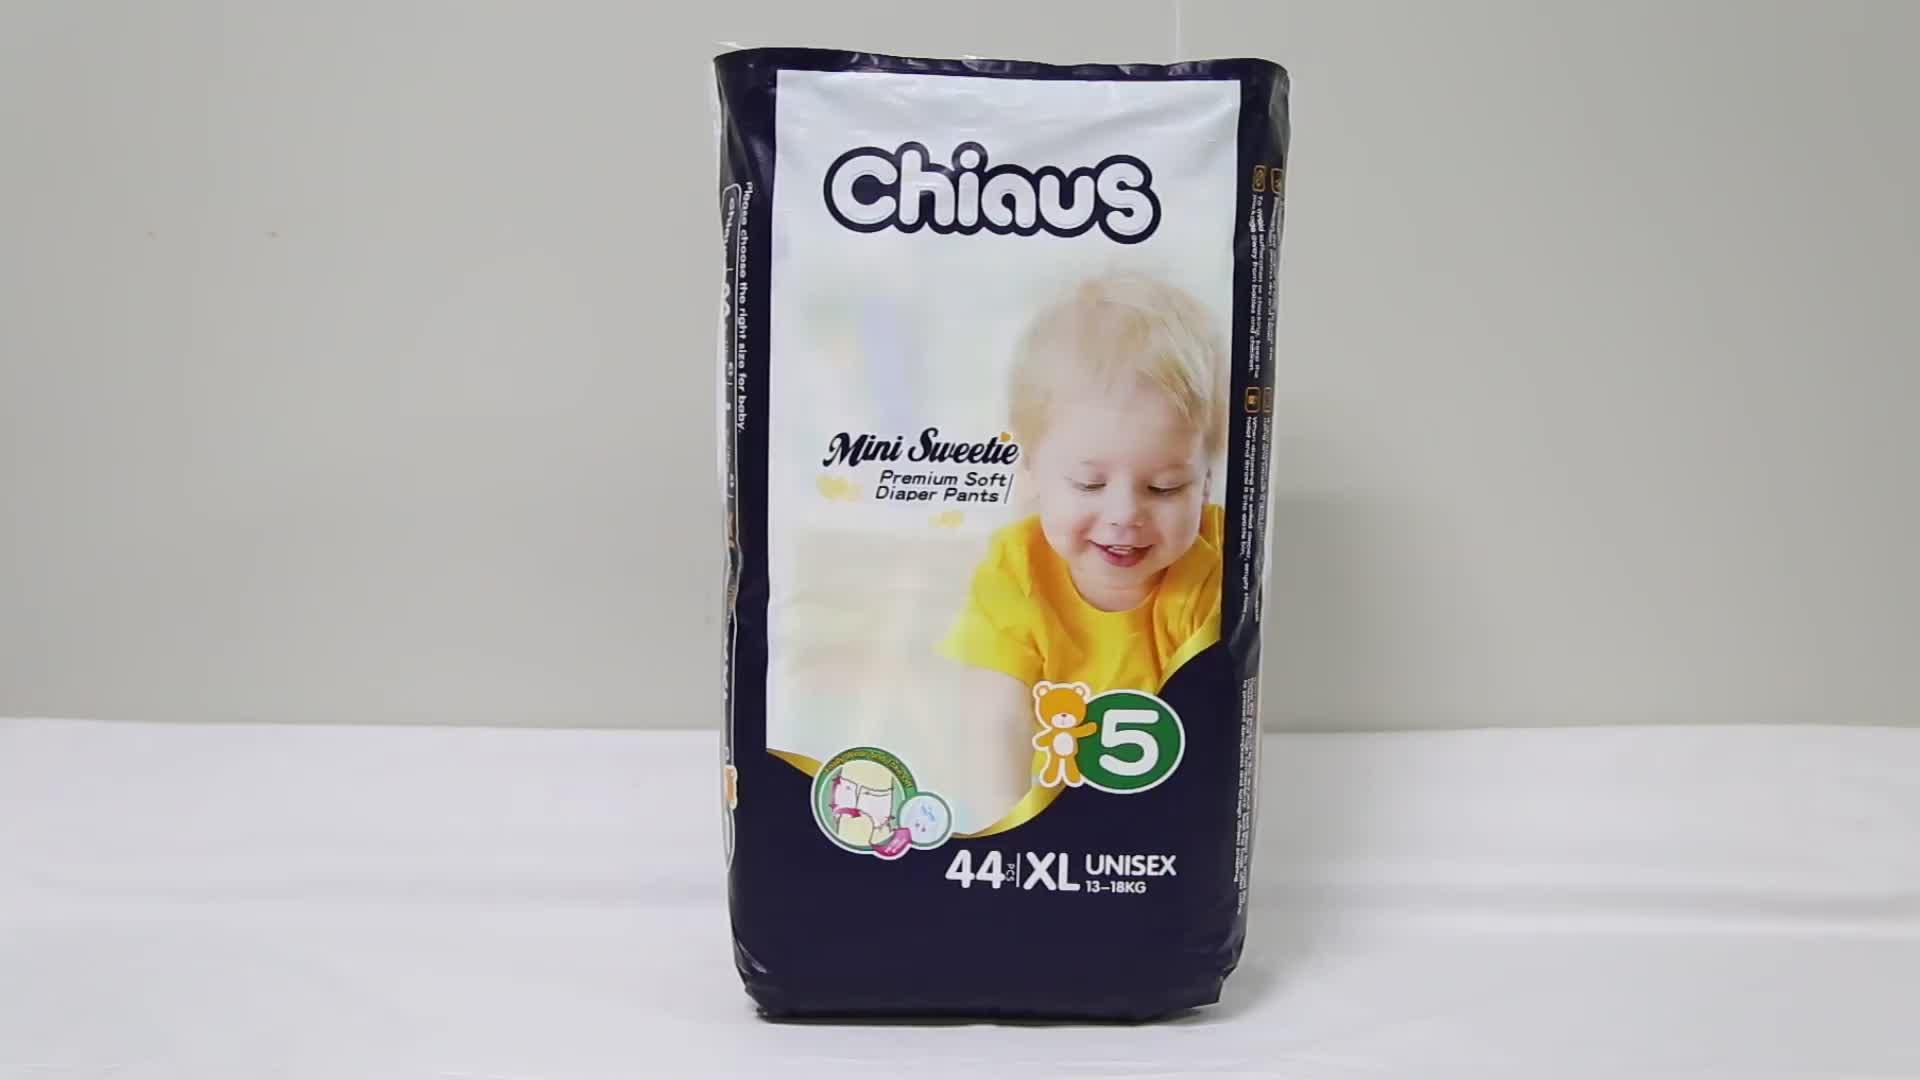 Chiaus गर्म बिक्री डायपर 360 लोचदार कमर बच्चे डायपर पैंट